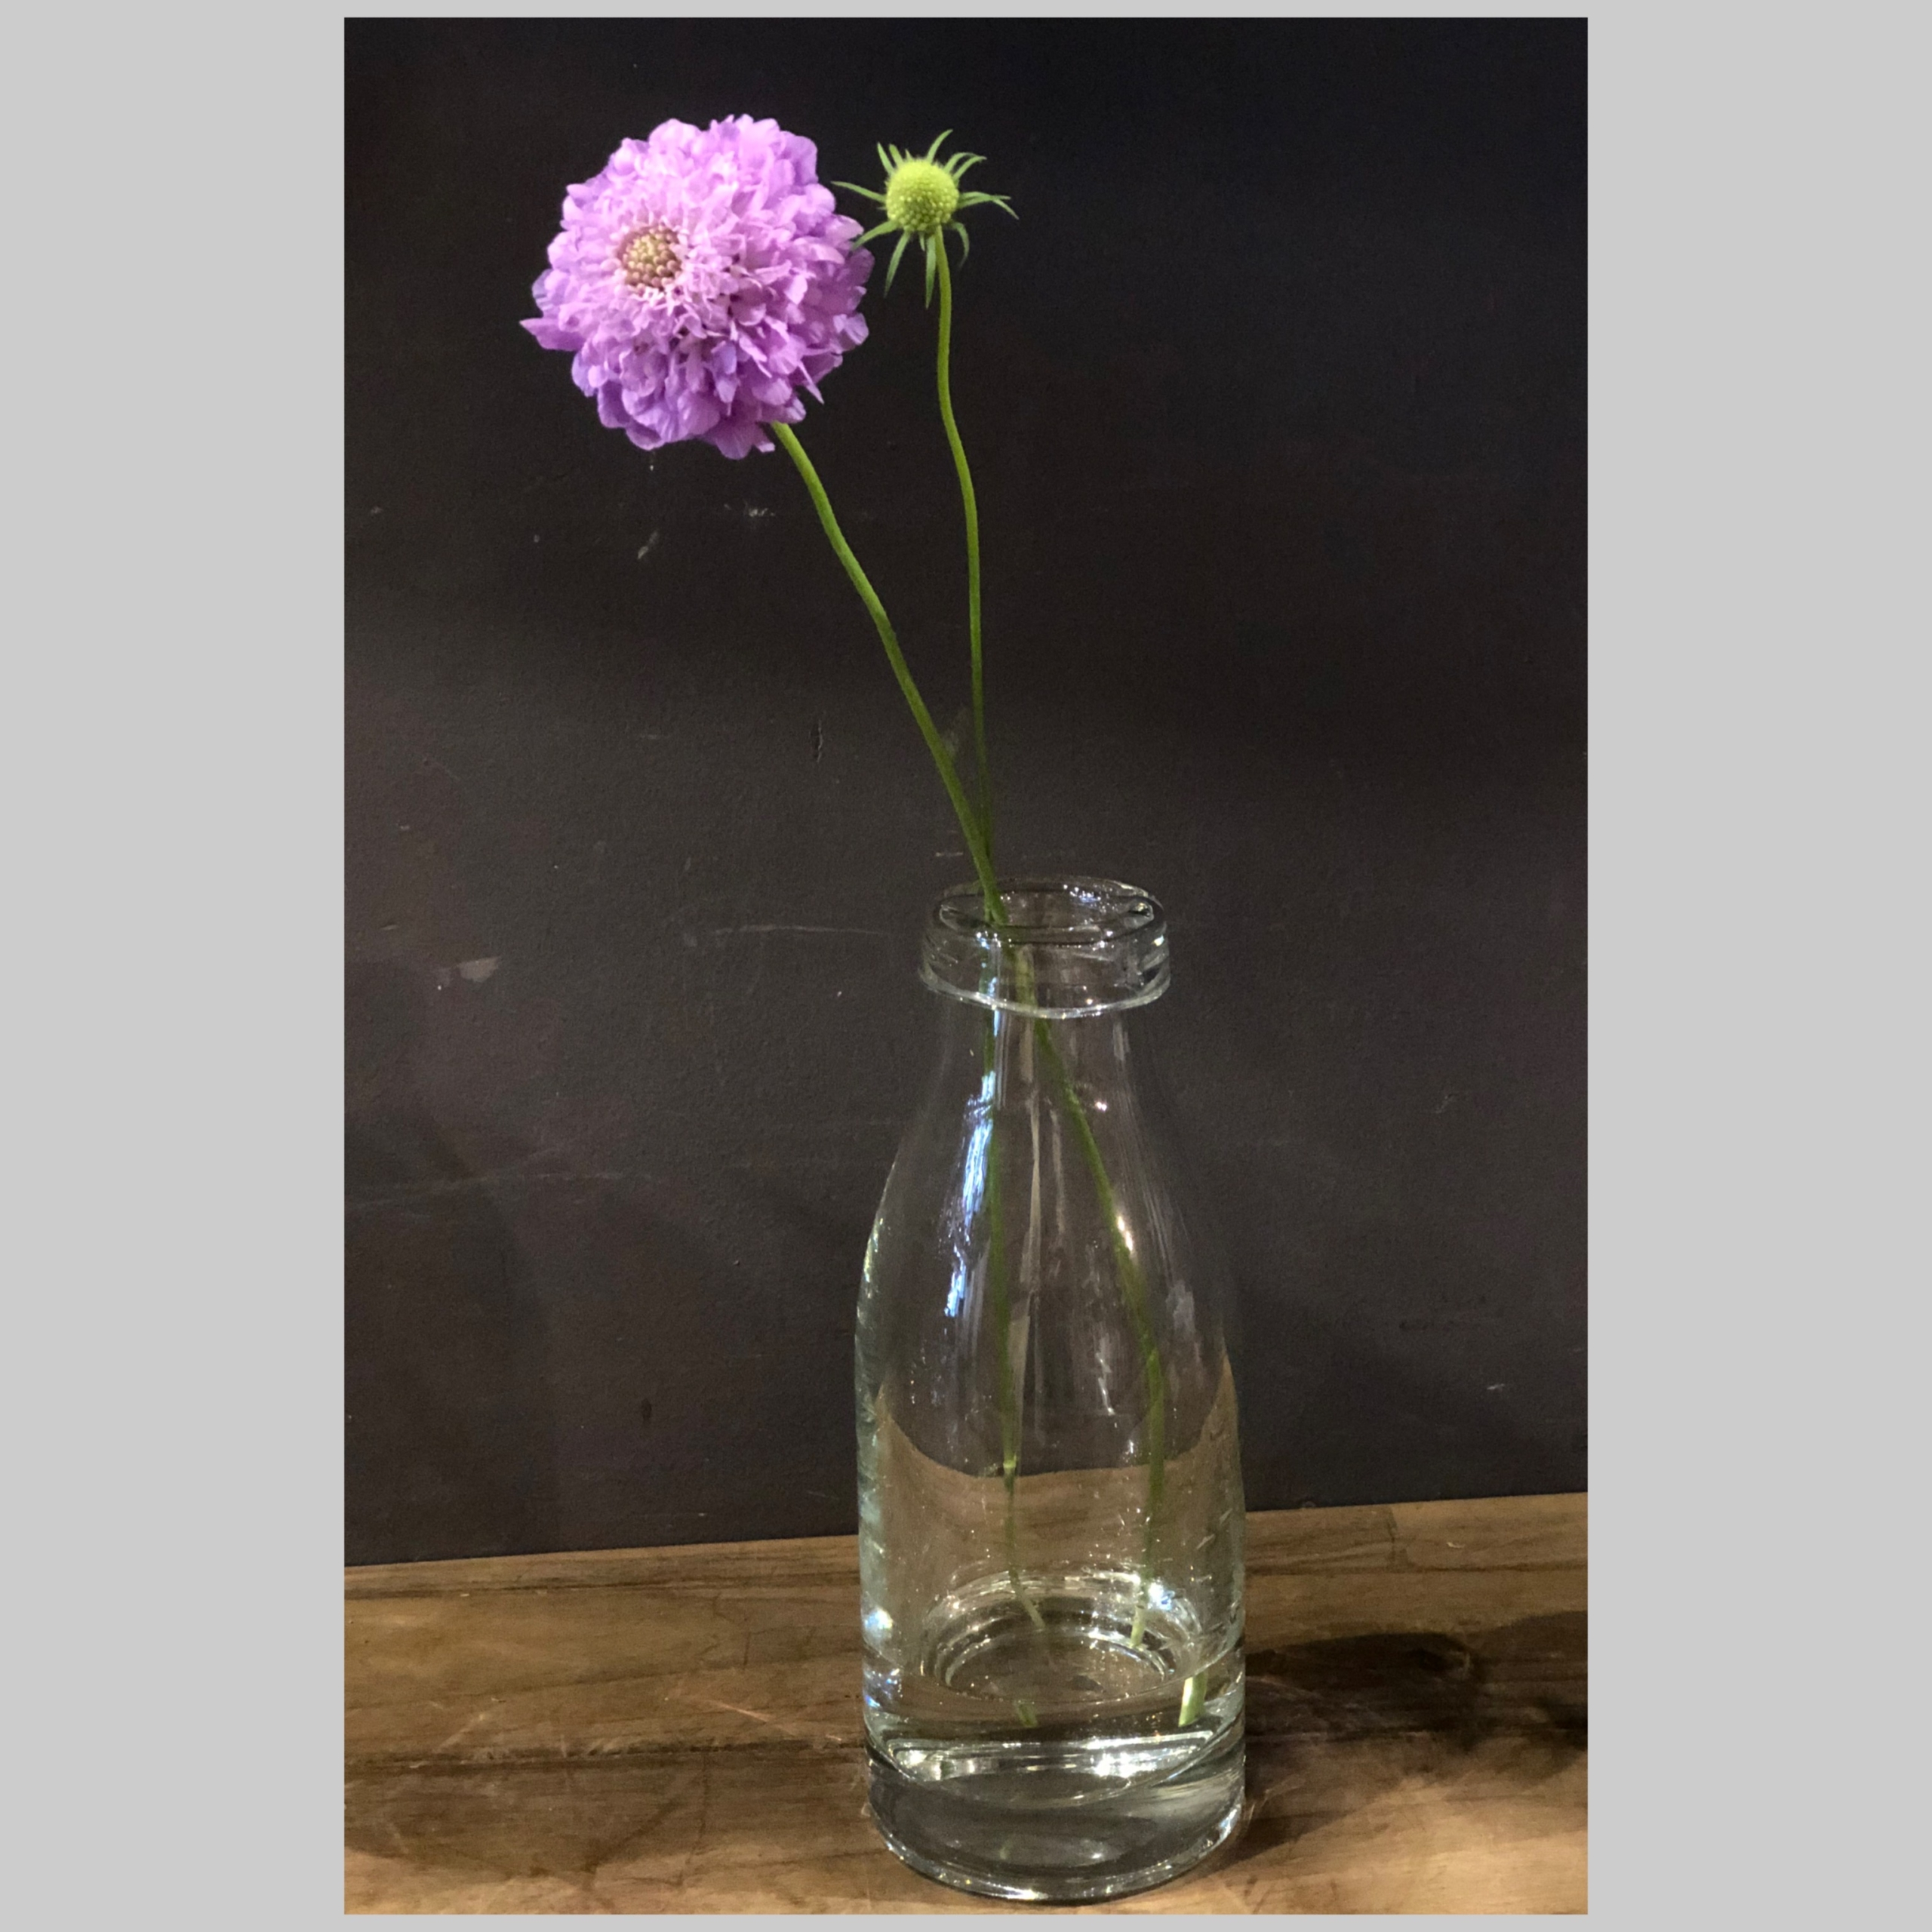 vase0002-milkbottle